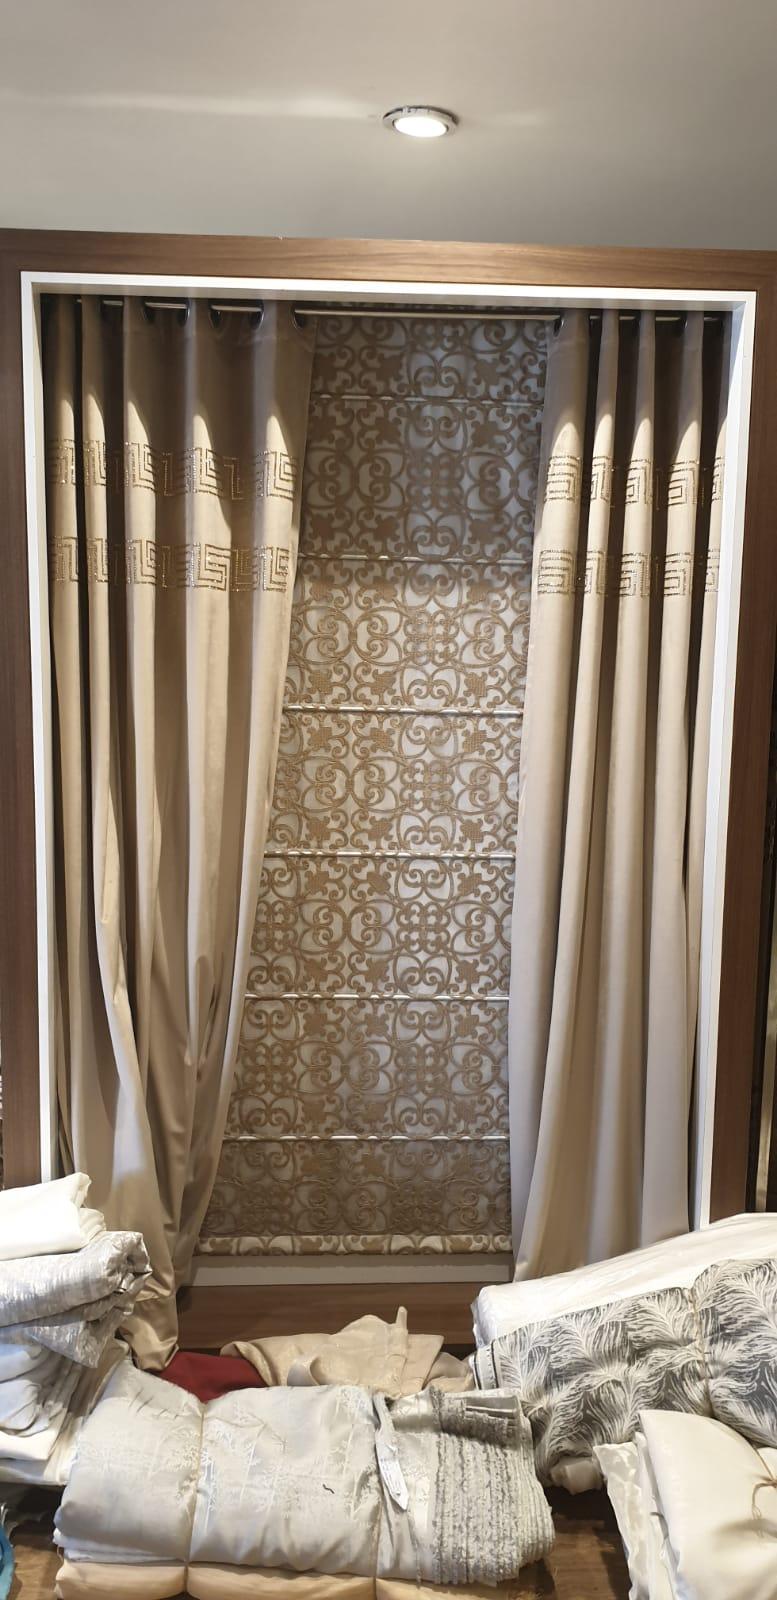 New Designer cream color blinds